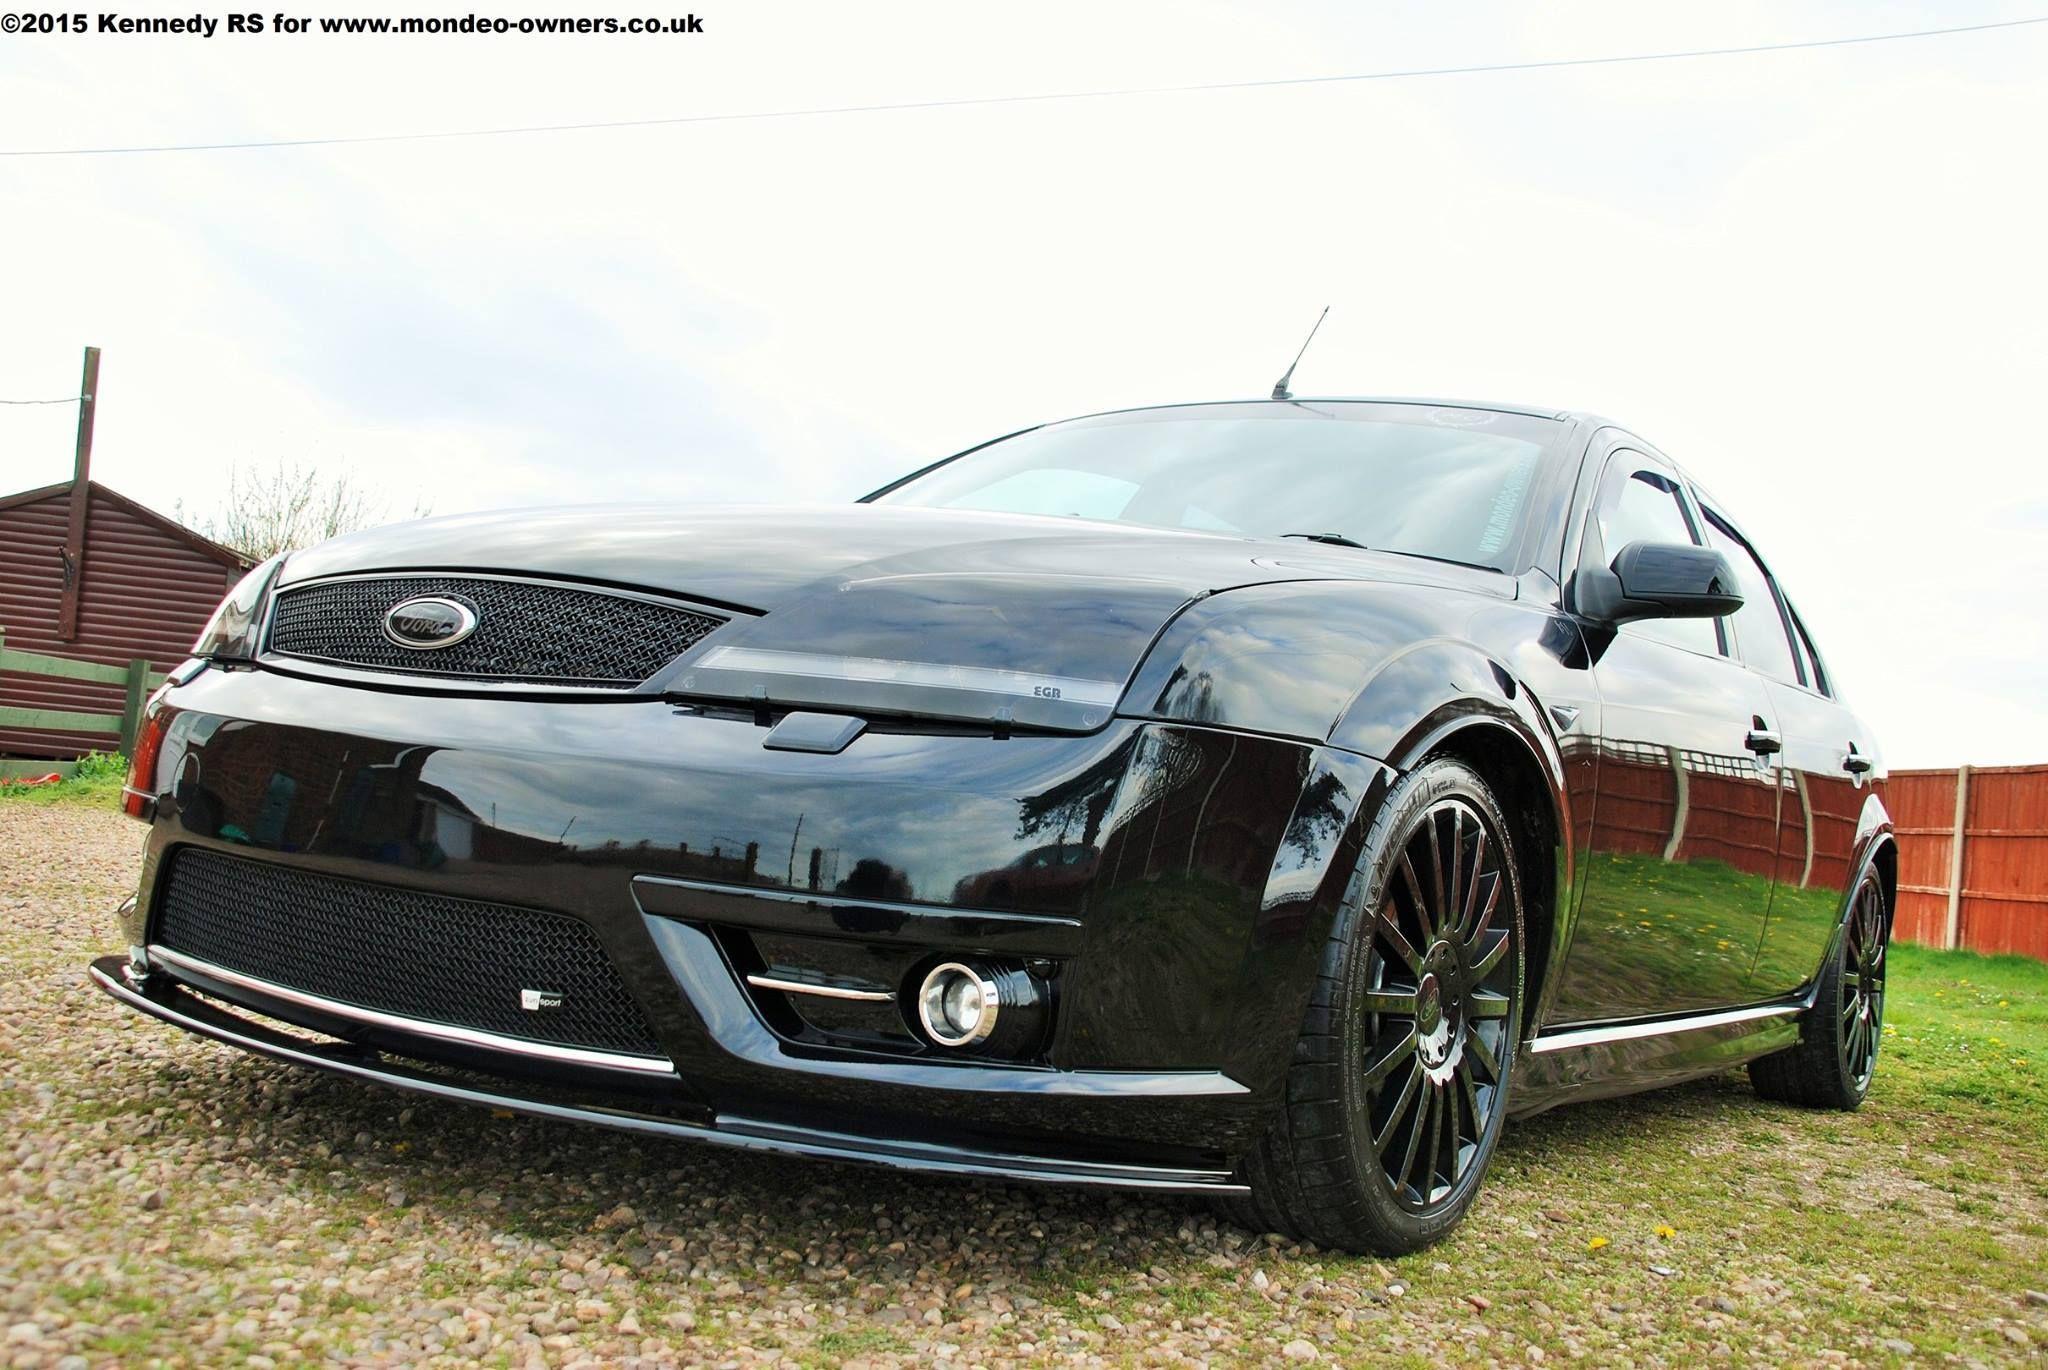 Ace Alloy Black Convex Wheel 20x8 5 13 14 Volkswagen Phaeton Black Wheels Ford Fusion Custom